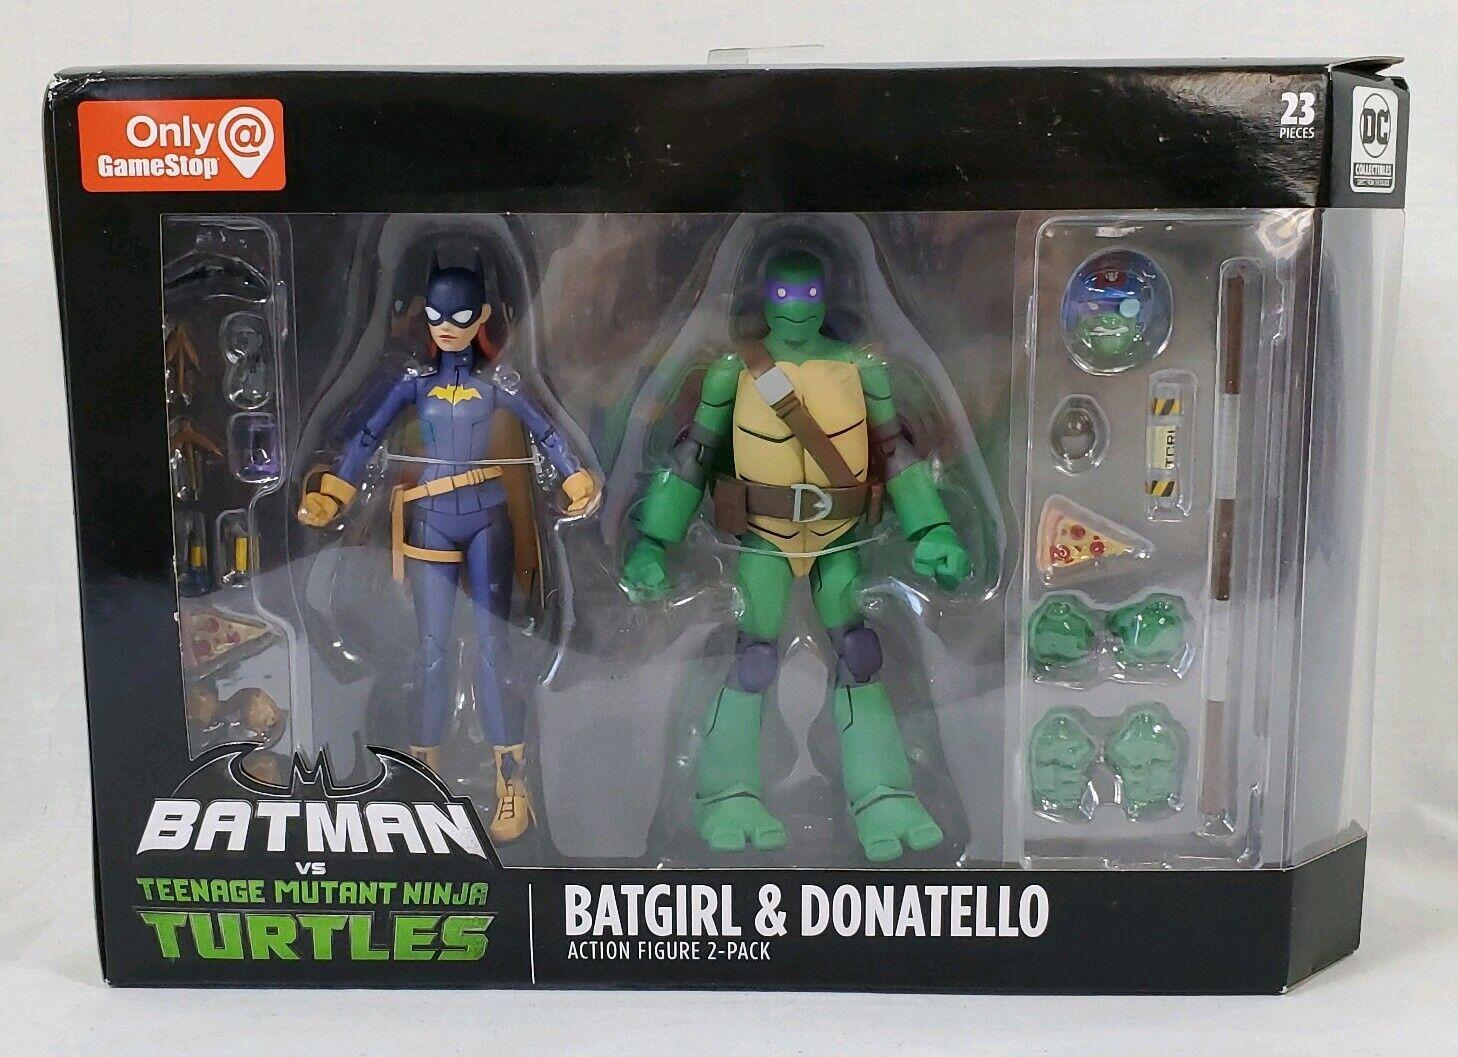 Batman Vs Teenage Mutant Ninja Turtles (TMNT) Donatello & Batgirl 2-Verpackung SDCC